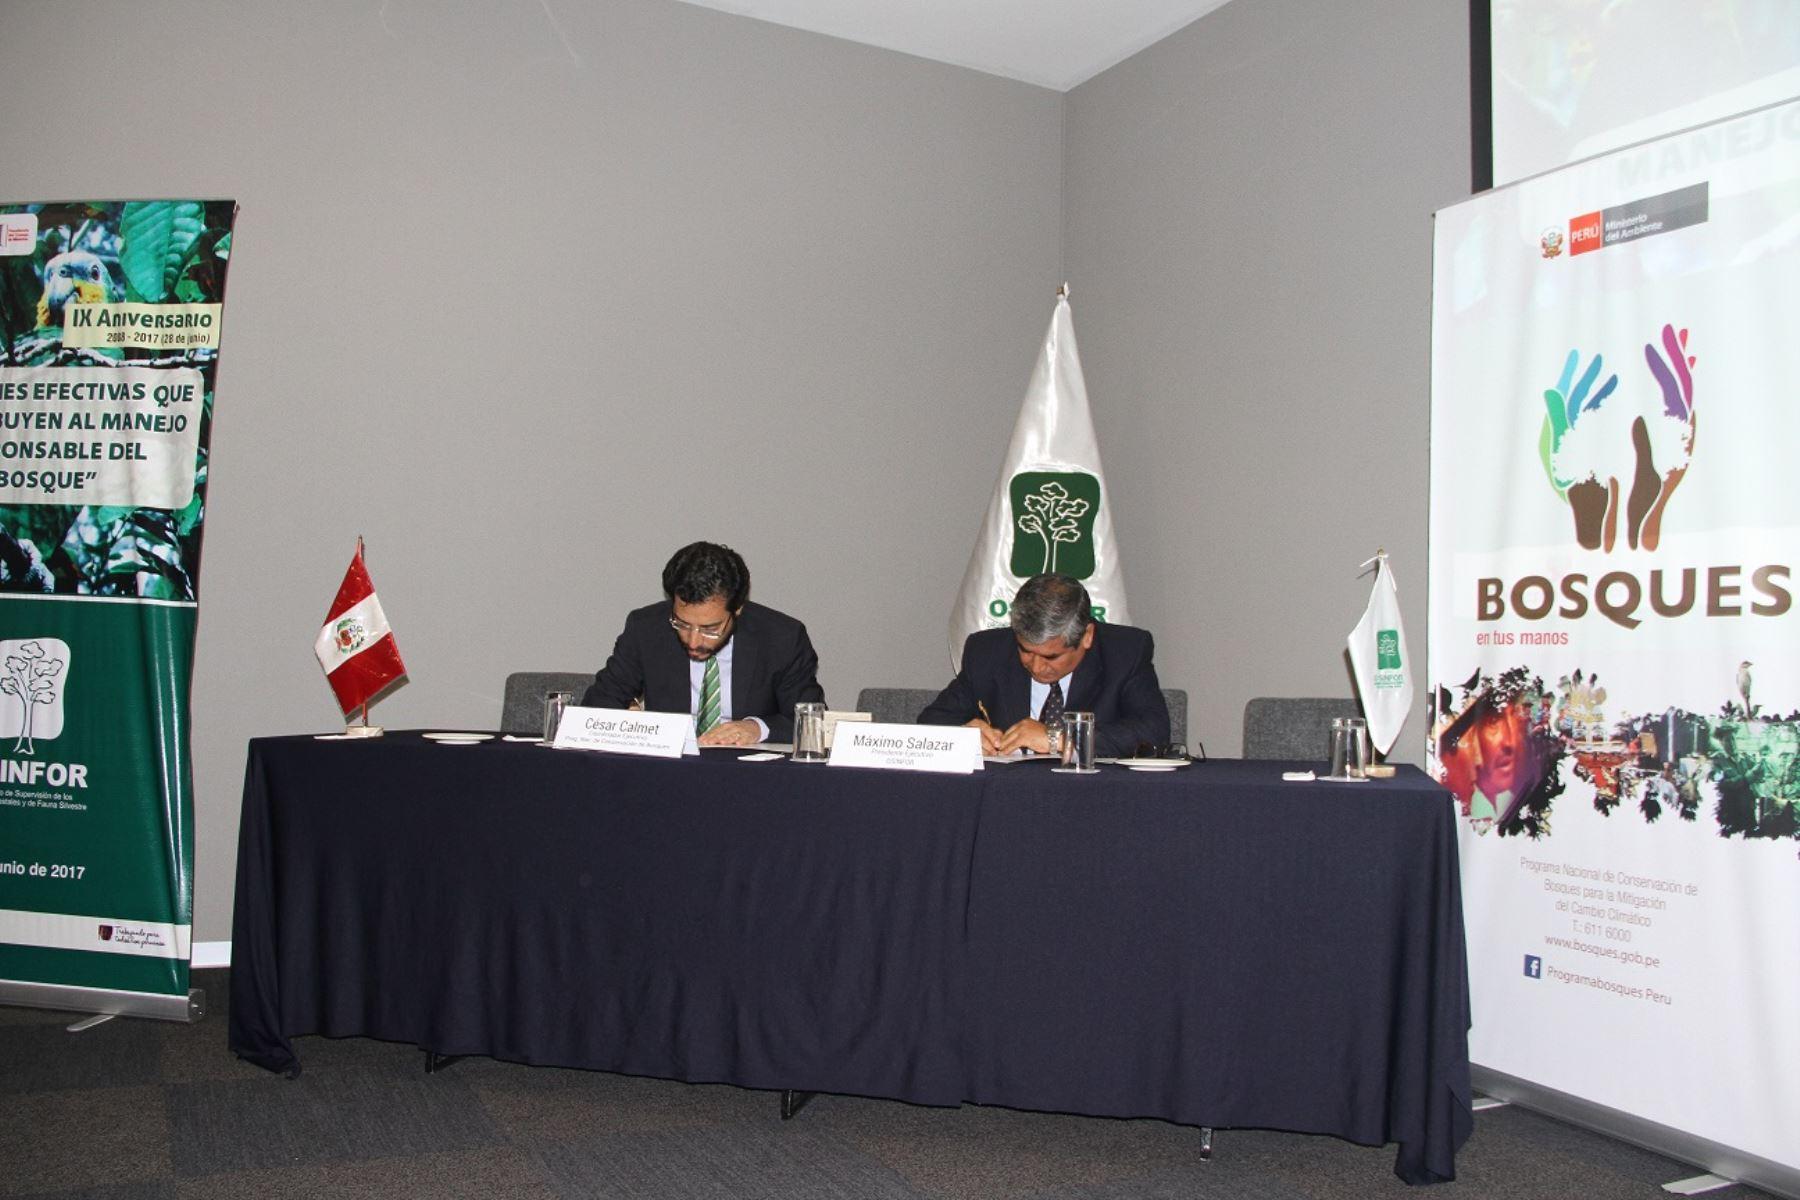 Osinfor y Programa Bosques suscriben convenio para unir esfuerzos para conservación de bosques.